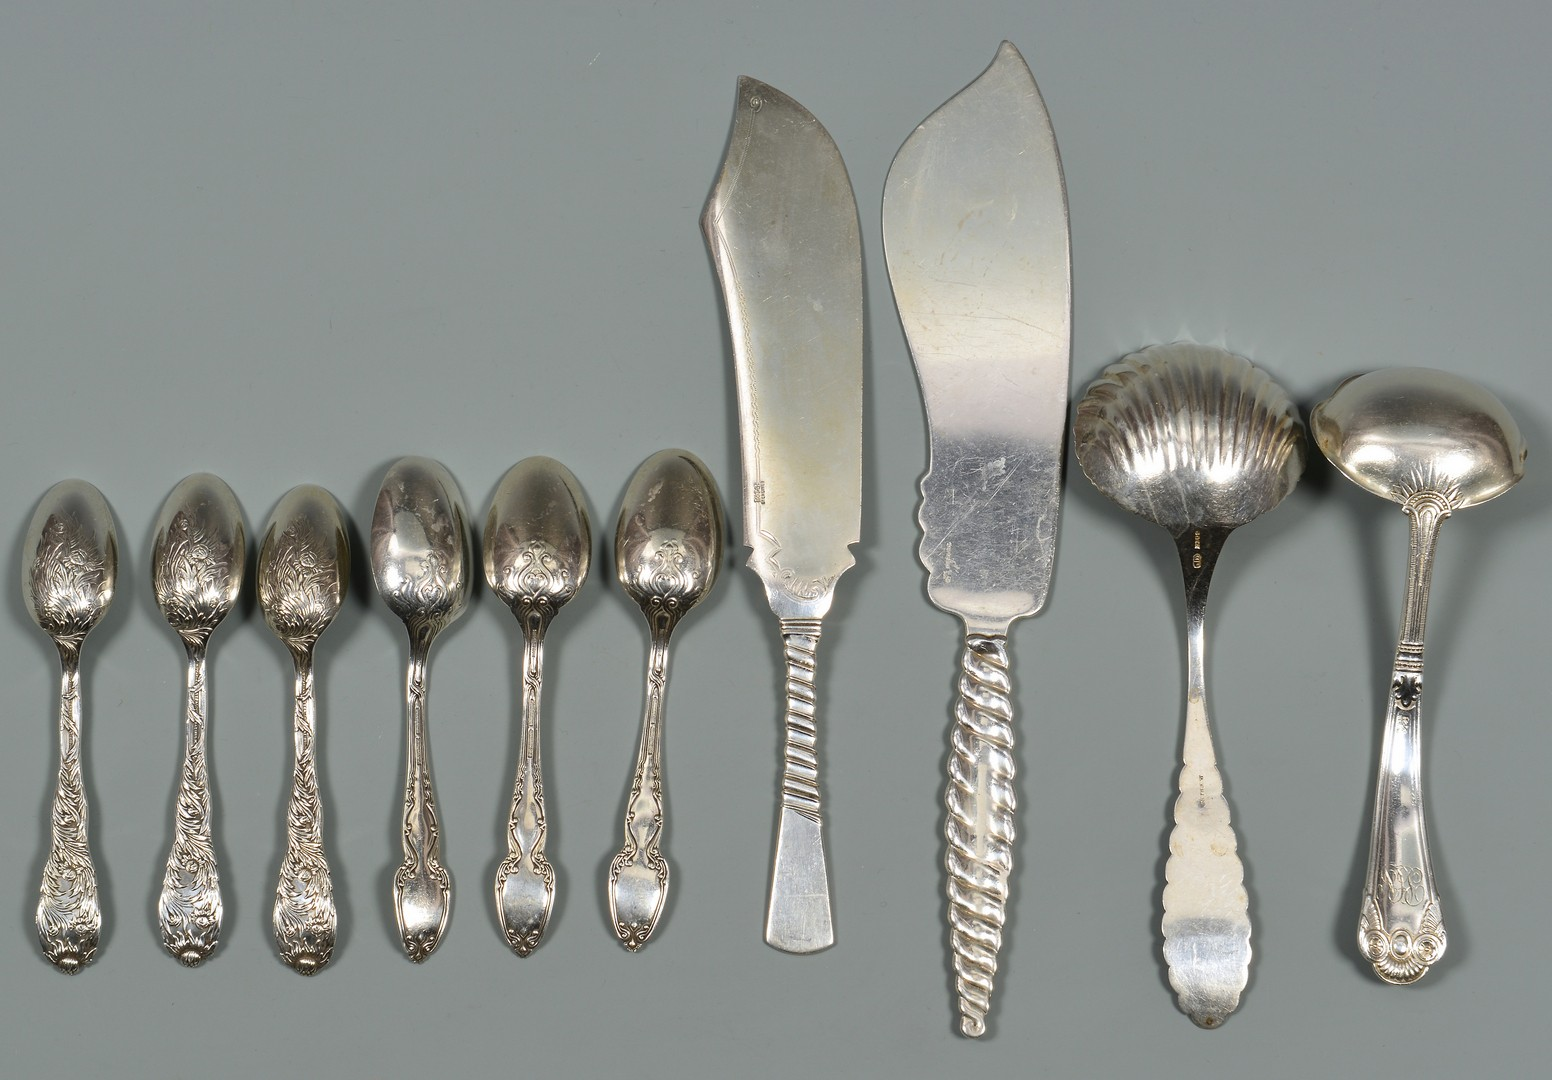 Lot 575: 10 pcs Tiffany, Gorham, etc. flatware